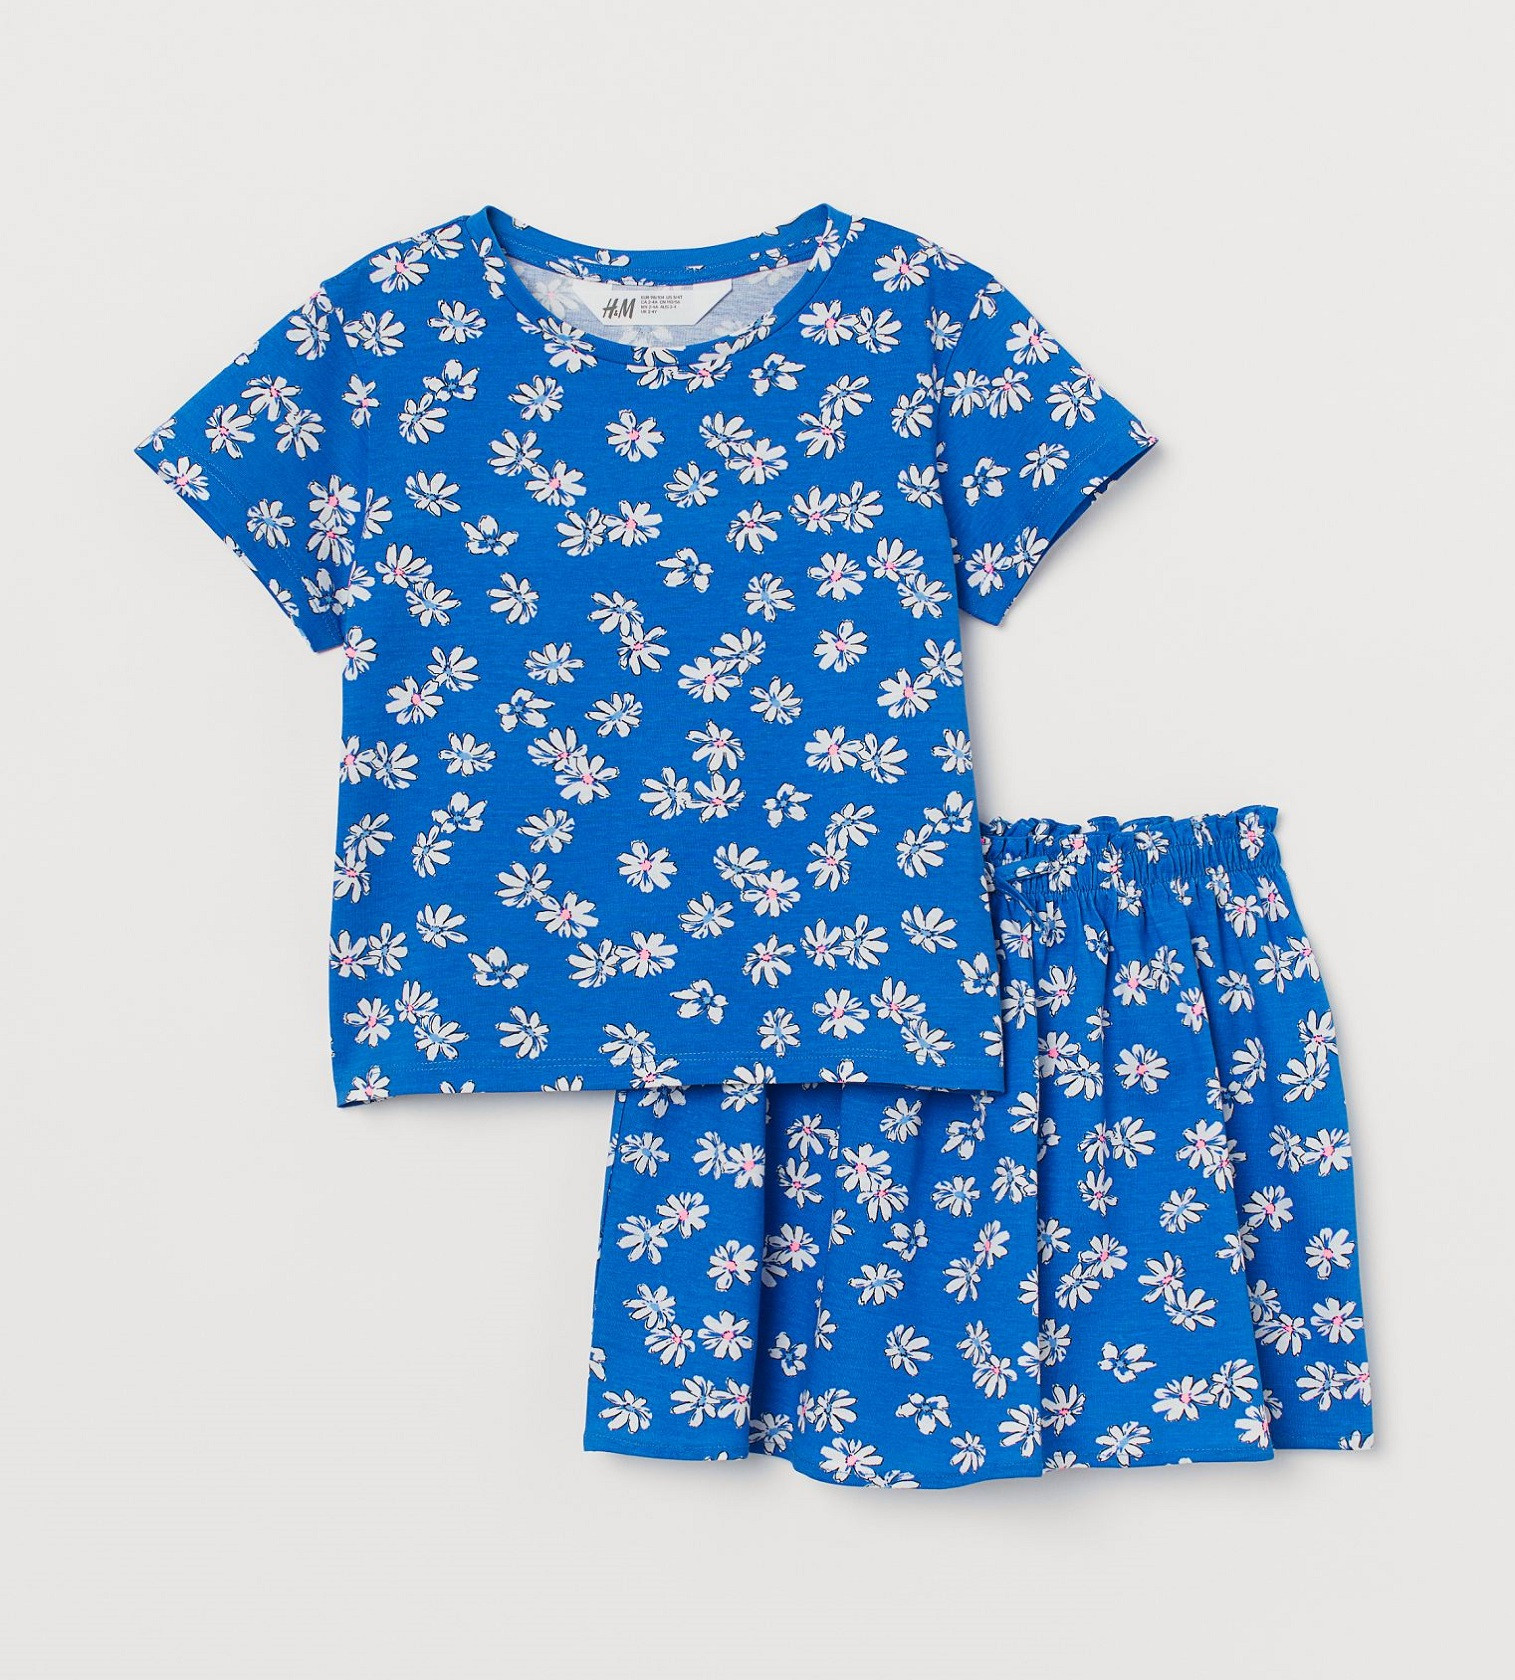 Купити Комплект H&M Blue/Floral - фото 1